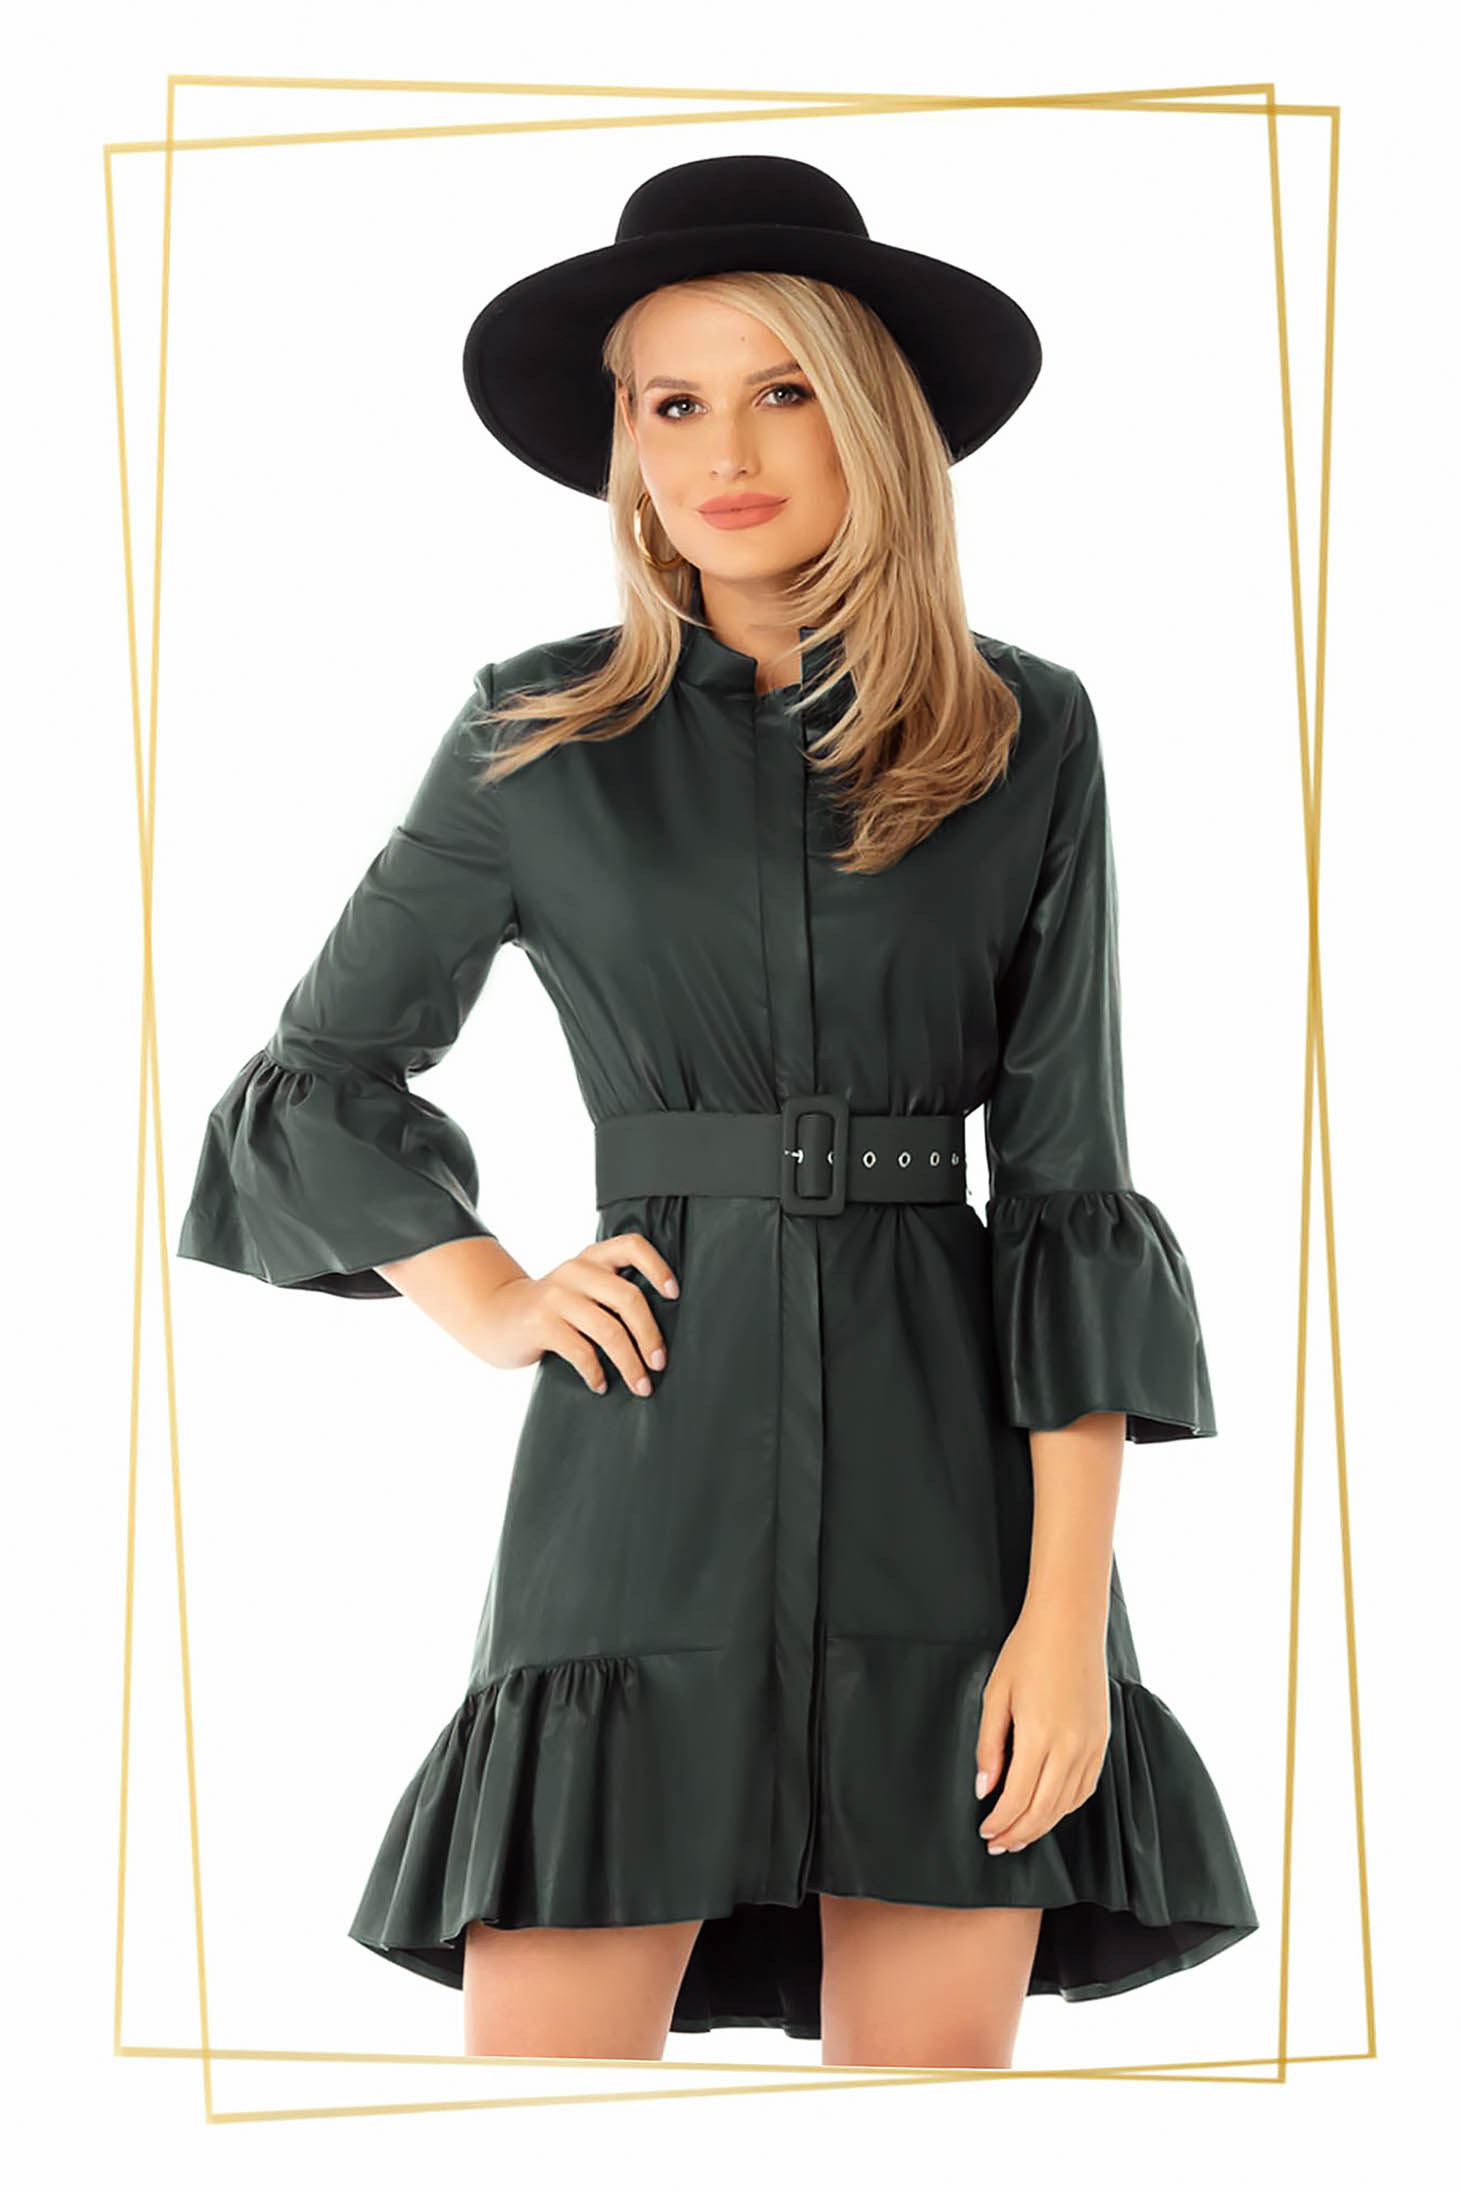 Rochie PrettyGirl din piele ecologica verde petrol asimetrica croi in clos cu maneci clopot si volanase la baza rochiei